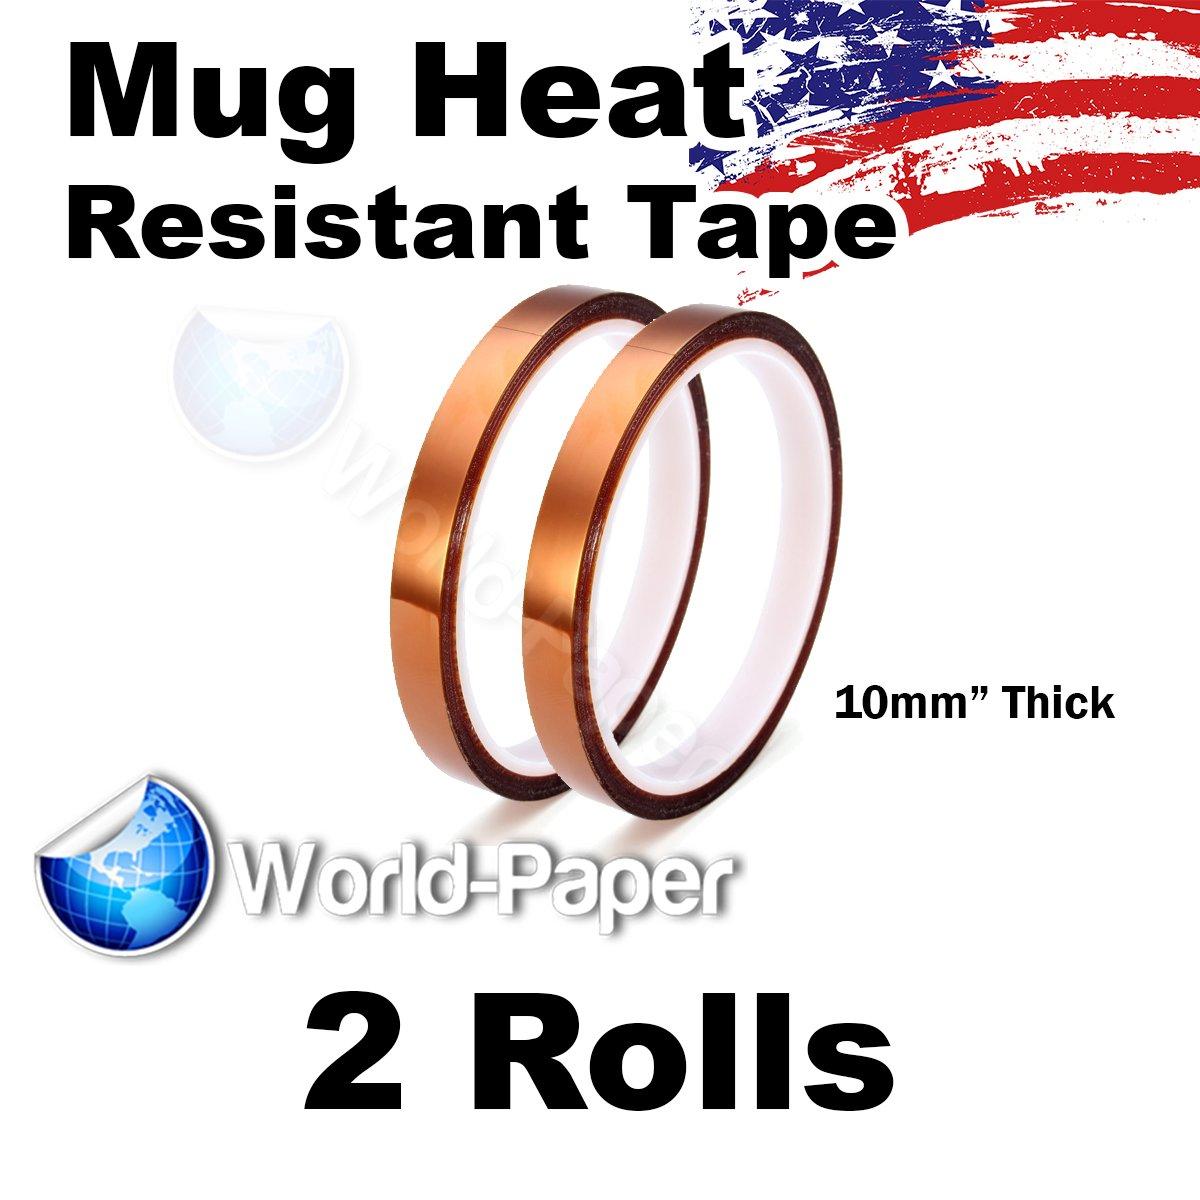 Kapton Tape 10mm 100ft 2 Rolls, For Mug Sublimation or Electric Work by world-paper